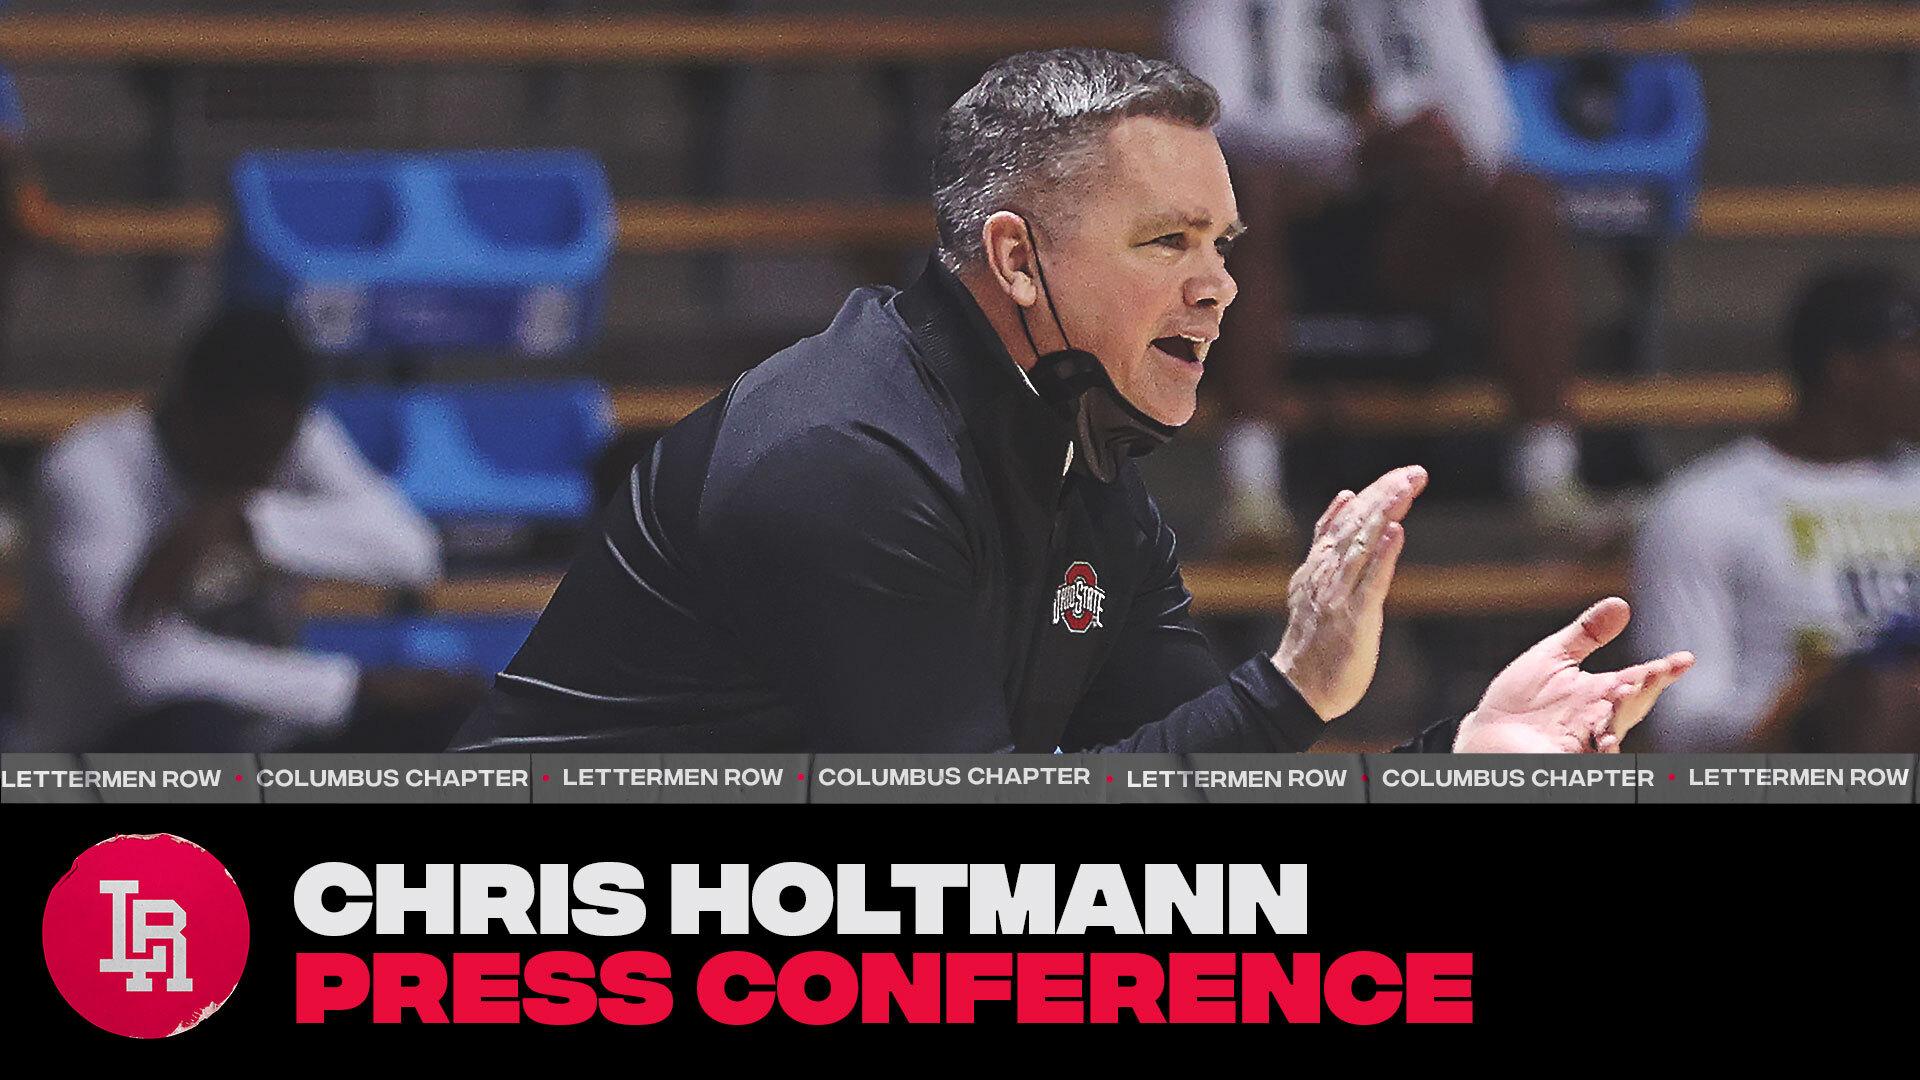 Chris-Holtmann-Oral-Roberts-Press-Conference